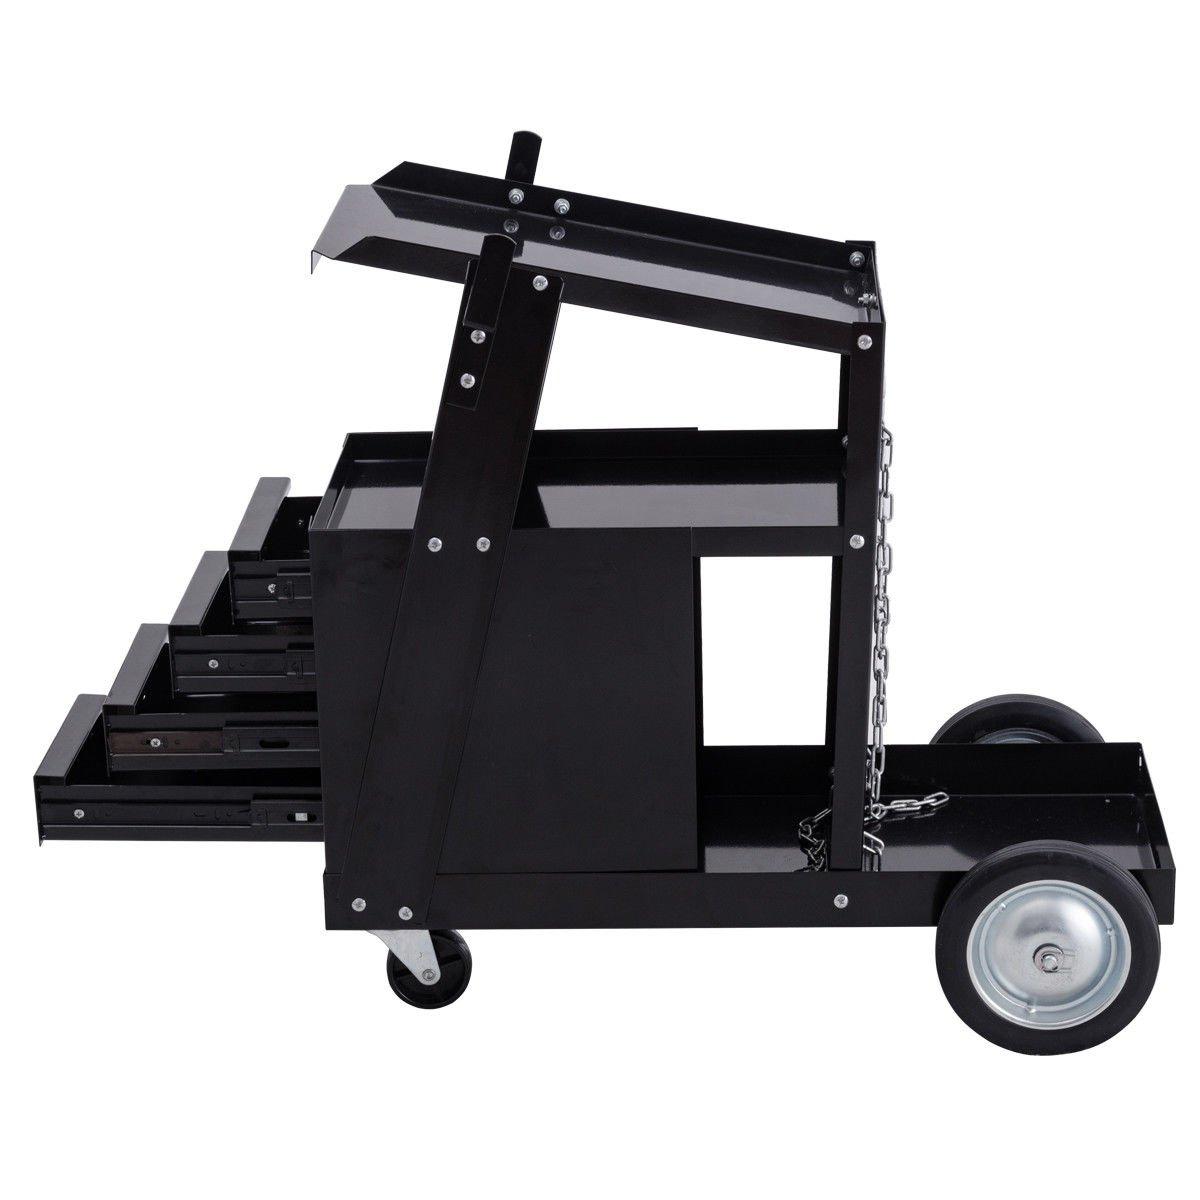 Goplus Welding Welder Cart Trolley Heavy Duty Workshop Organizer For Mig Parts Diagram Bill39s Repair Welders Tig Arc Plasma Cutter W 4 Drawer Cabinet